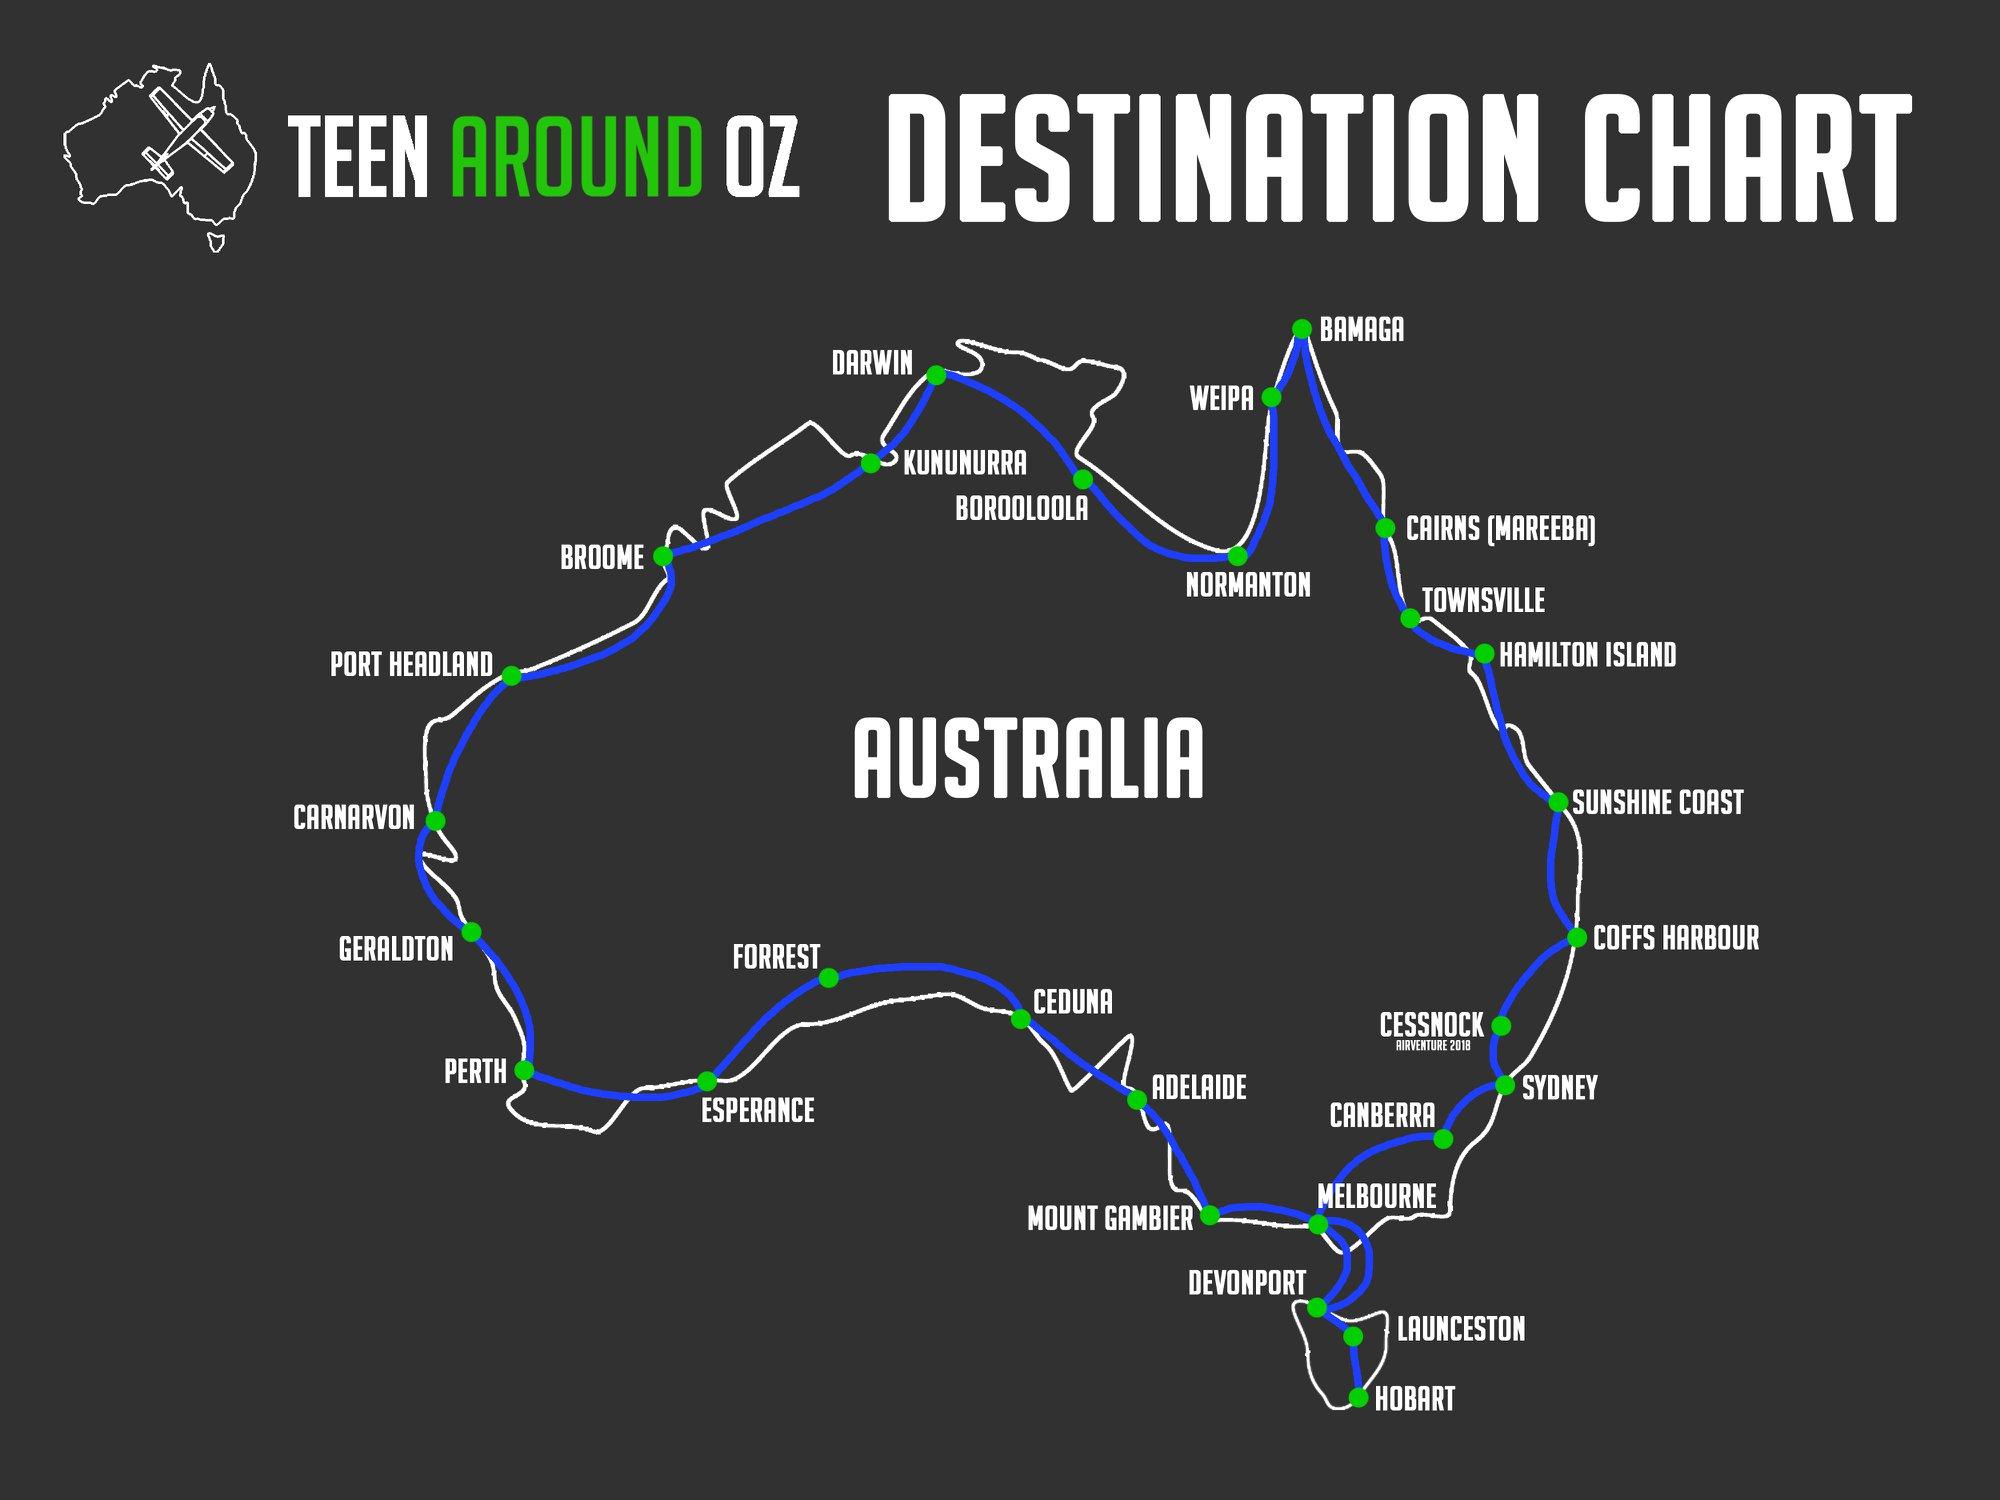 Morey's route around Australia on his World Record Attempt (teenaroundoz.com)